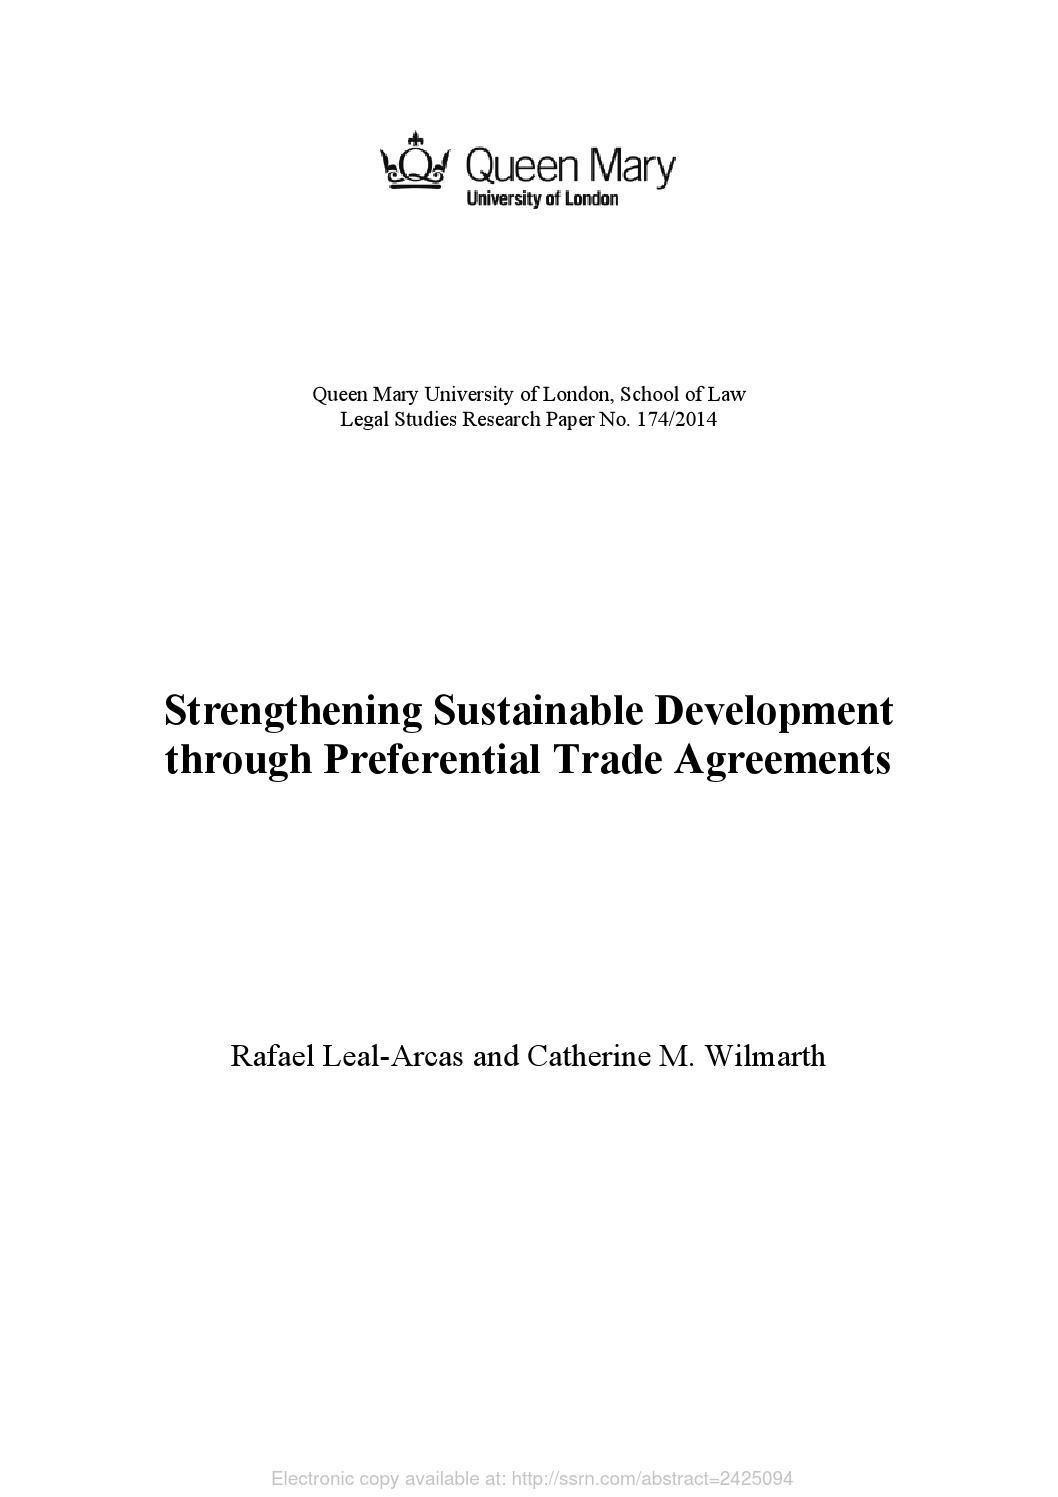 Strengthening Sustainable Development Through Preferential Trade